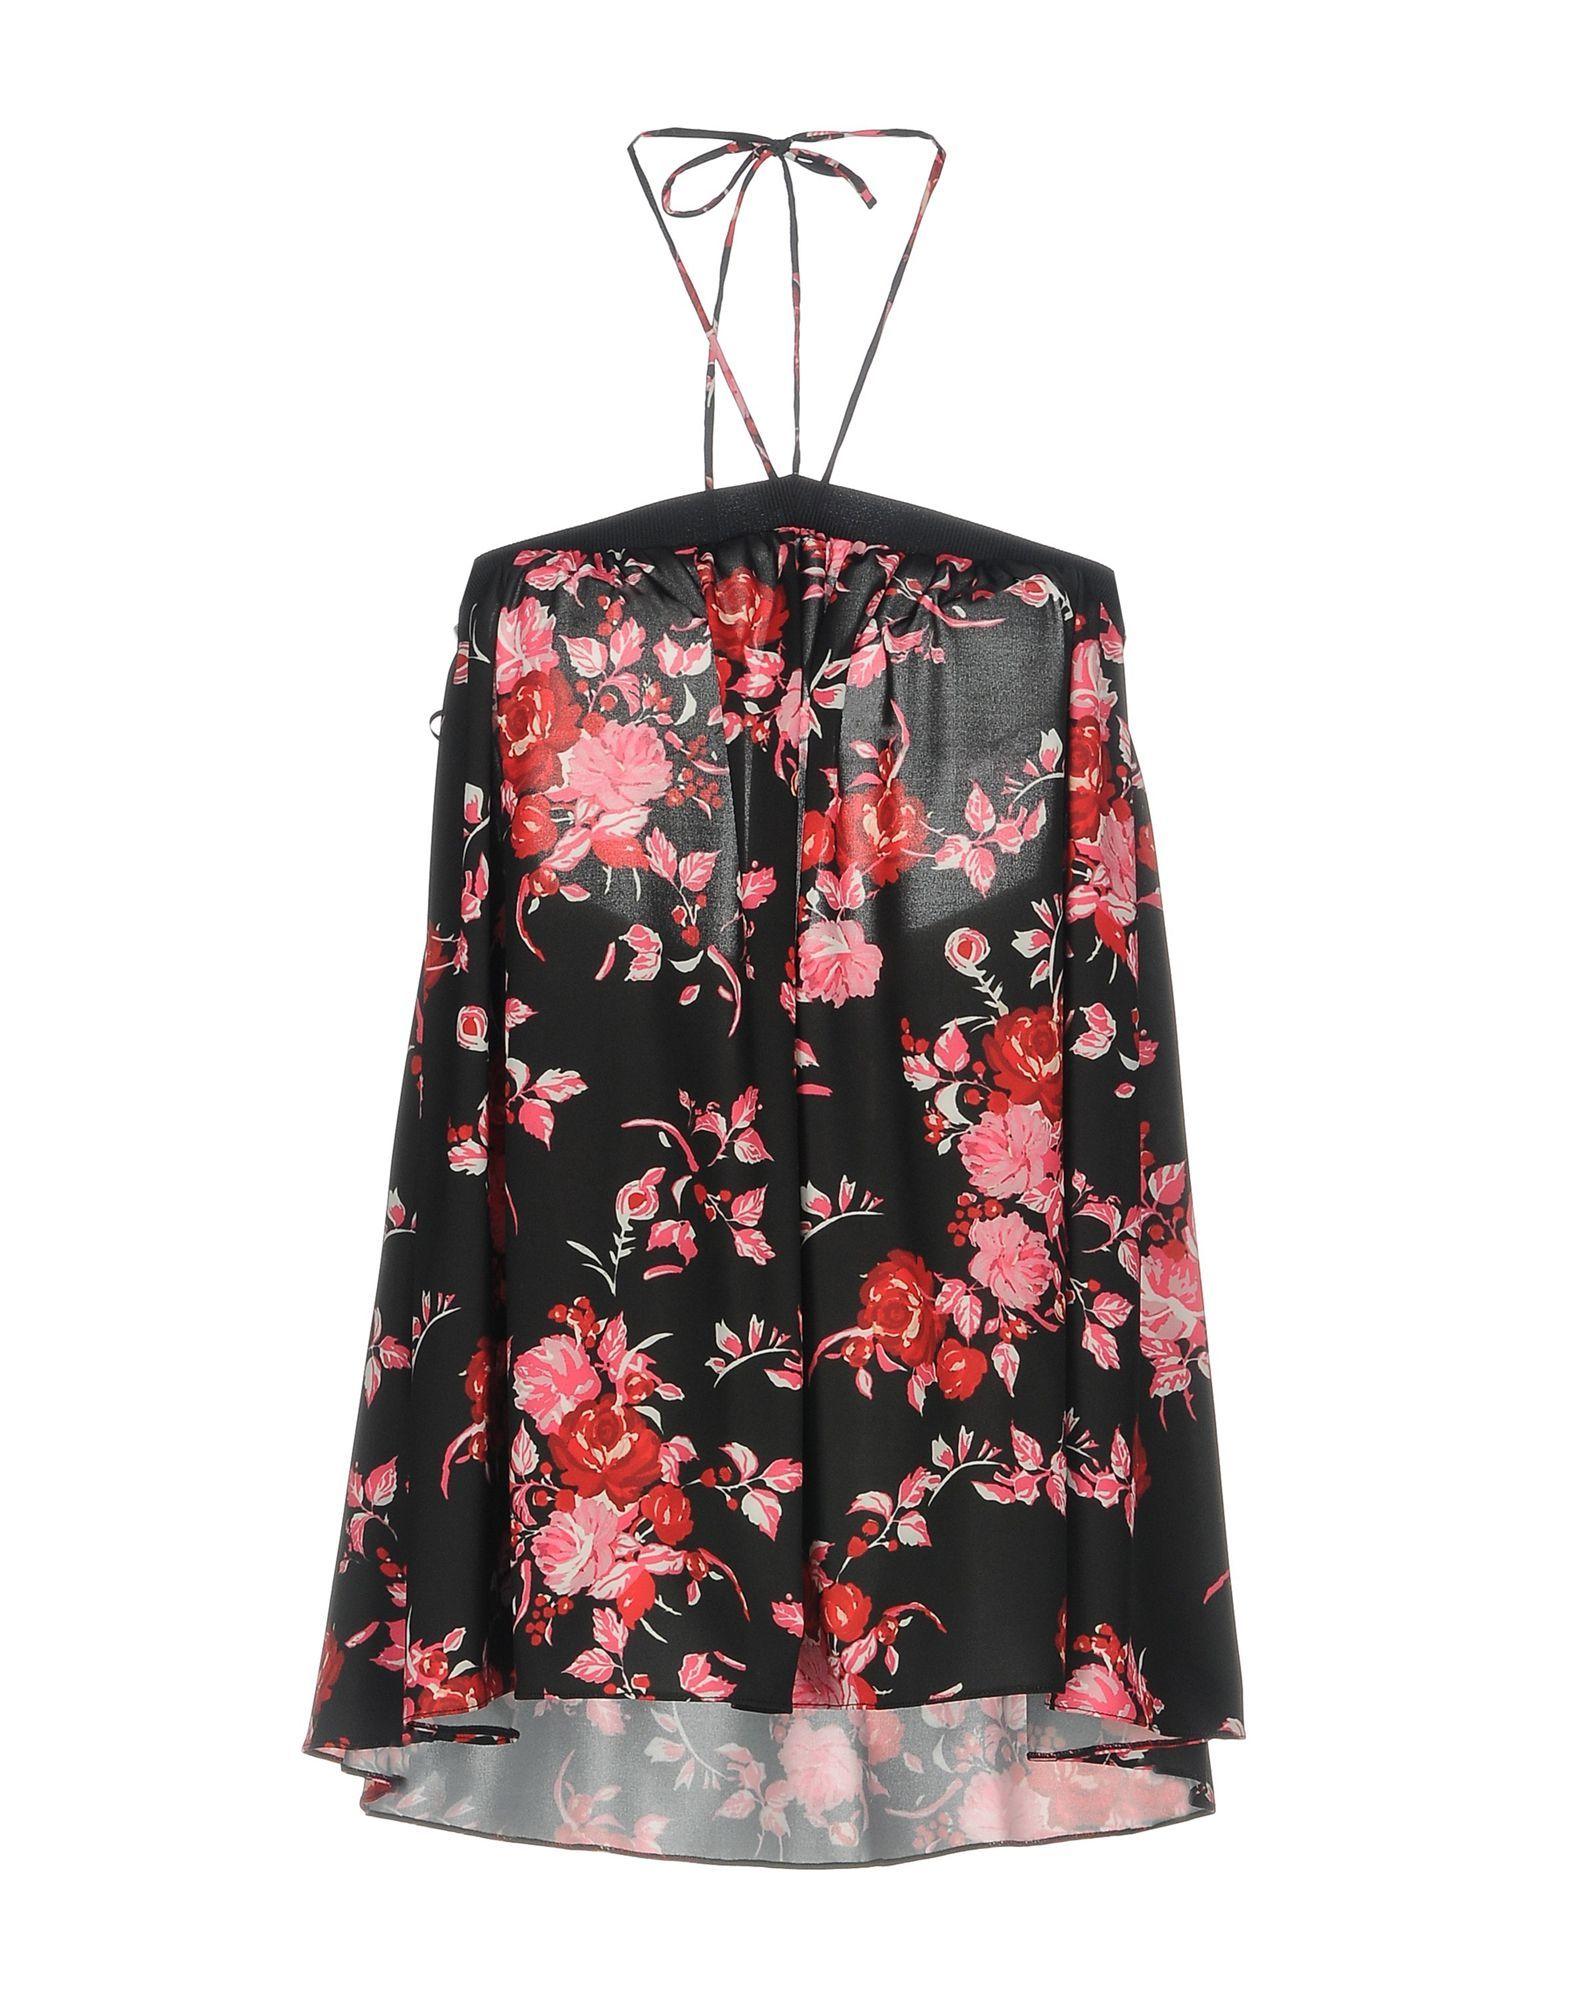 Pinko Black Floral Print Camisole